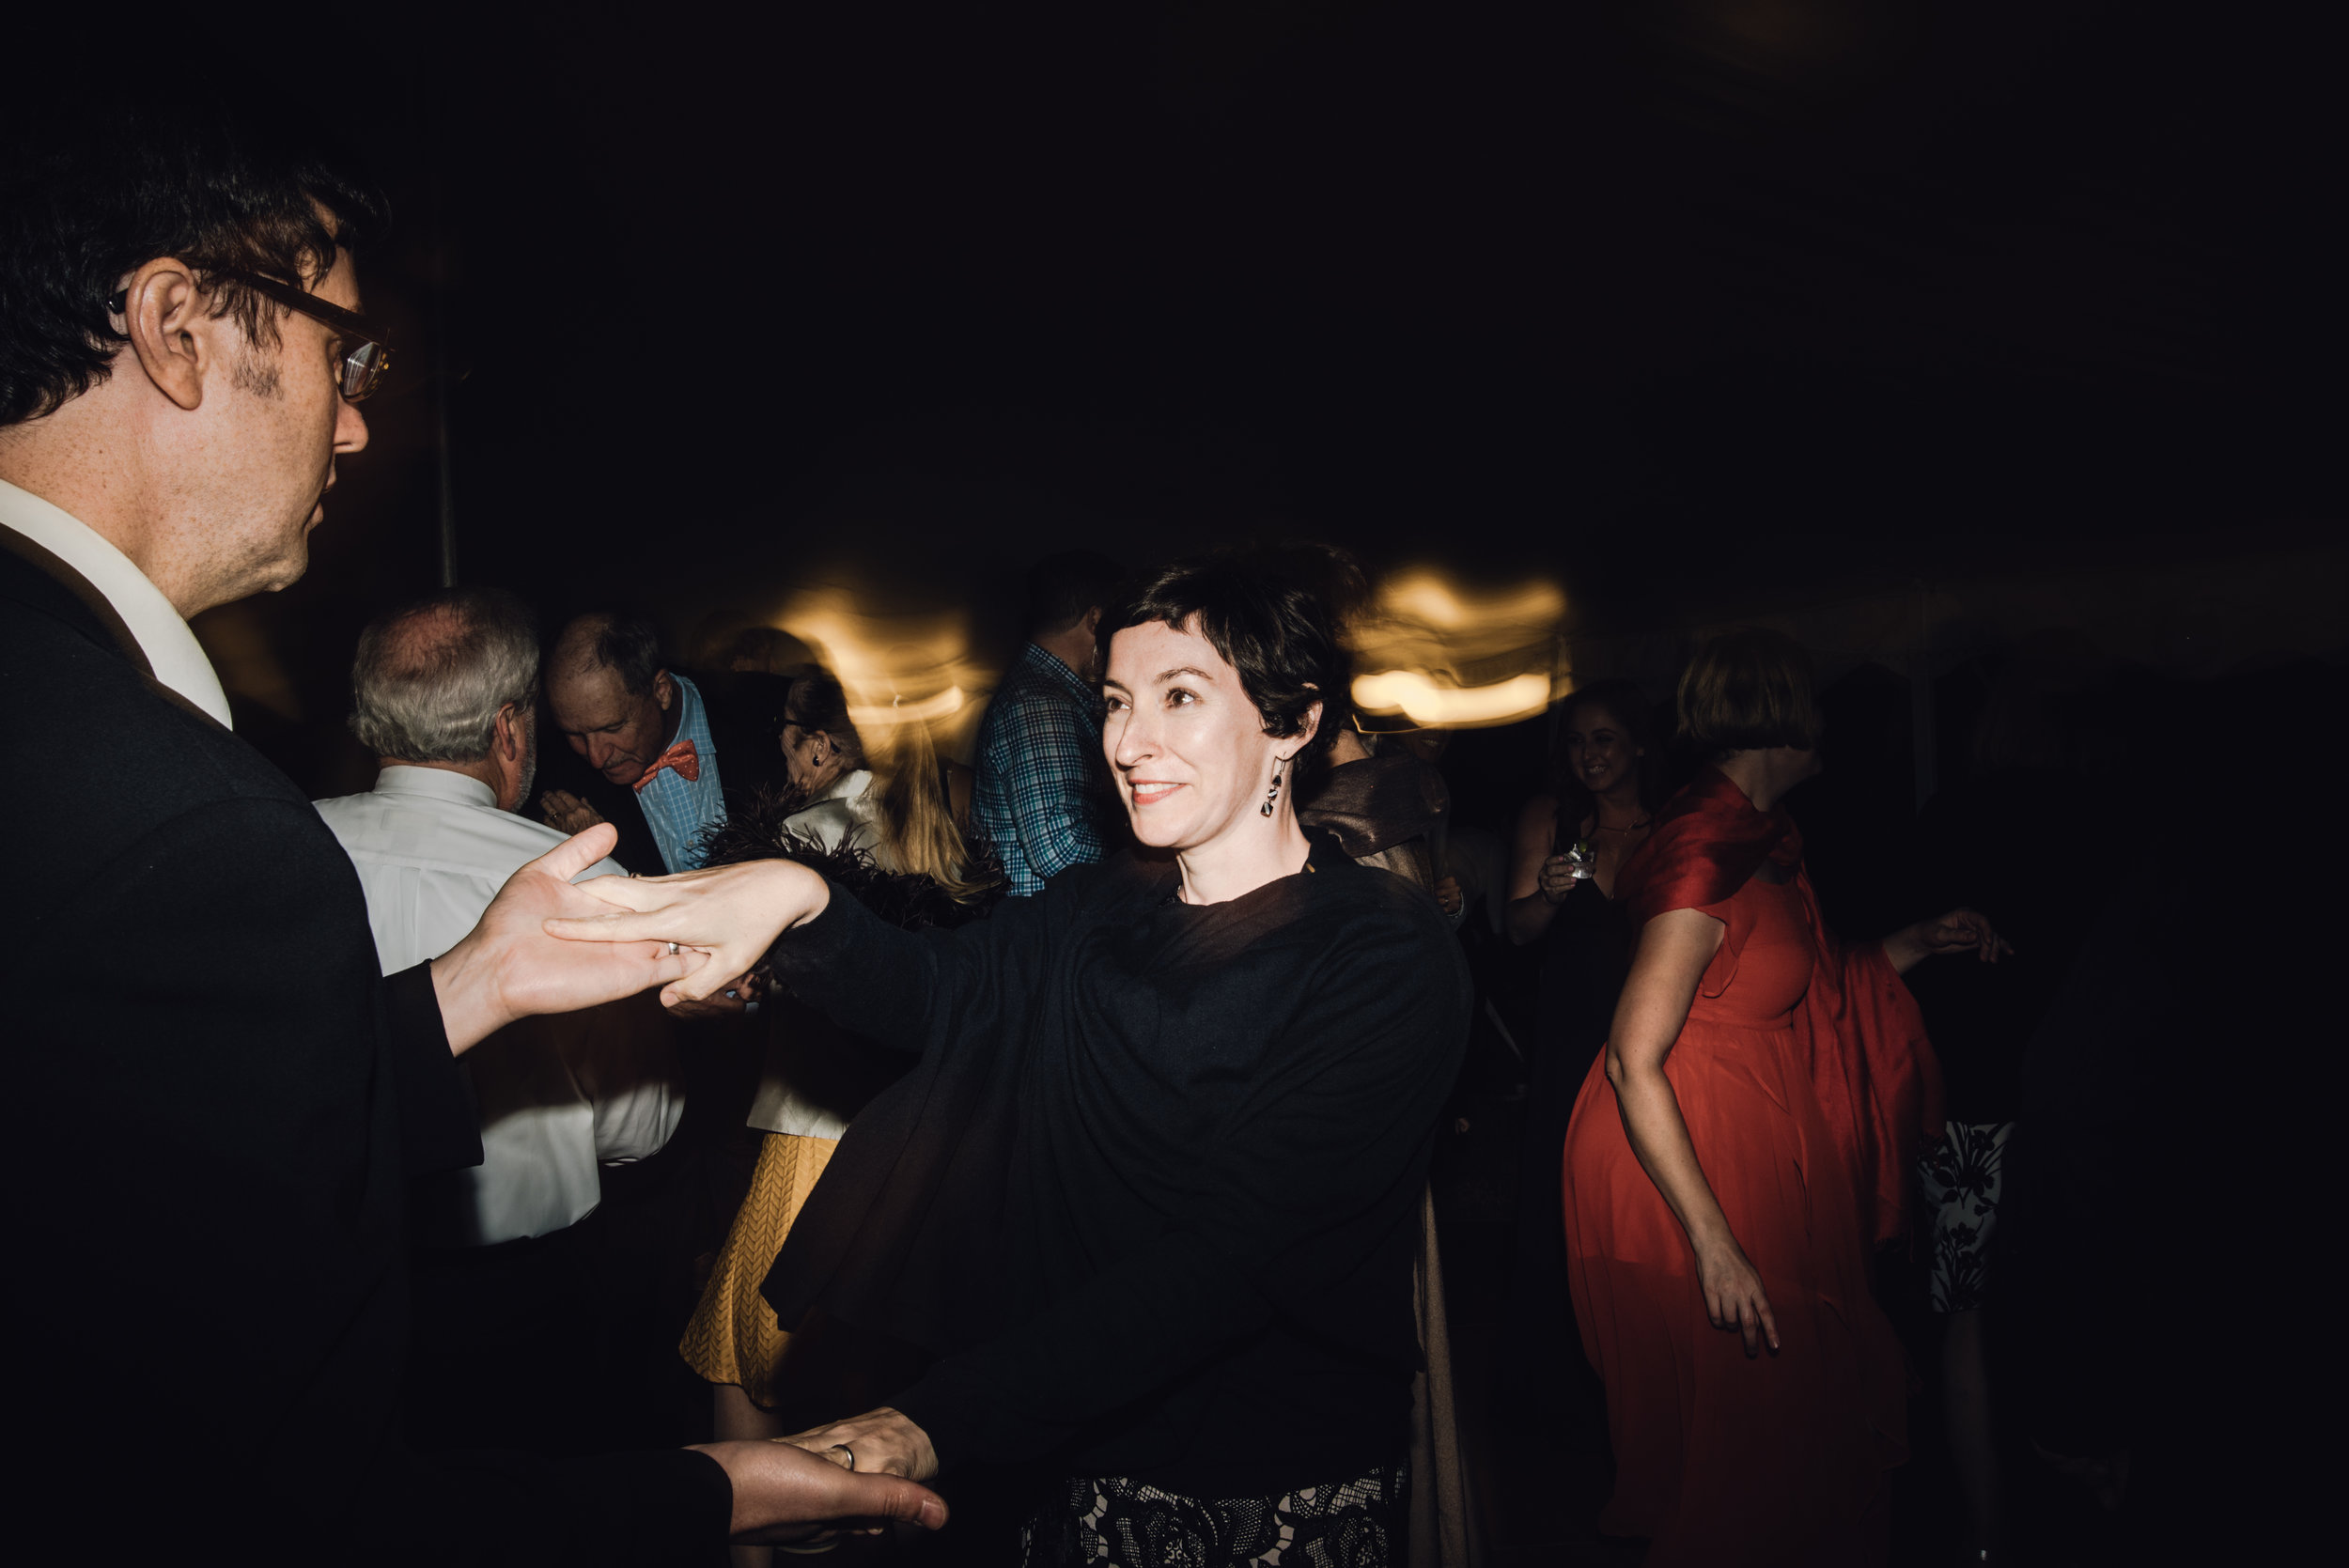 Main and Simple Photography_2017_Weddings_Mystic_T+N-1762.jpg